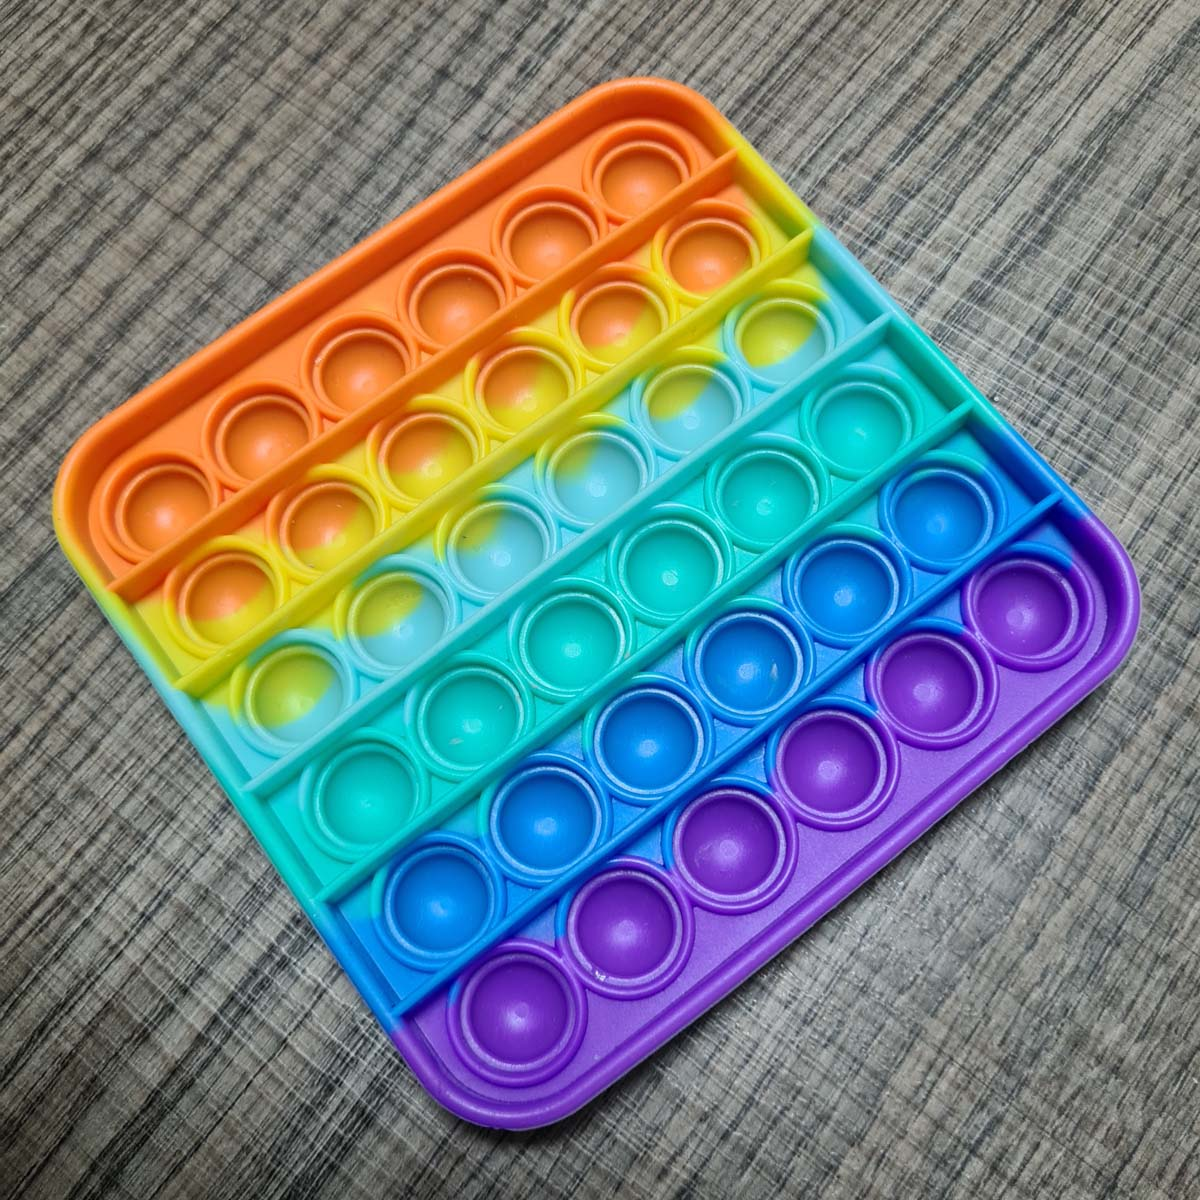 Brinquedo Pop It Fidget Toy Pop Push Bubble  Anti Stress Sensorial Colorido